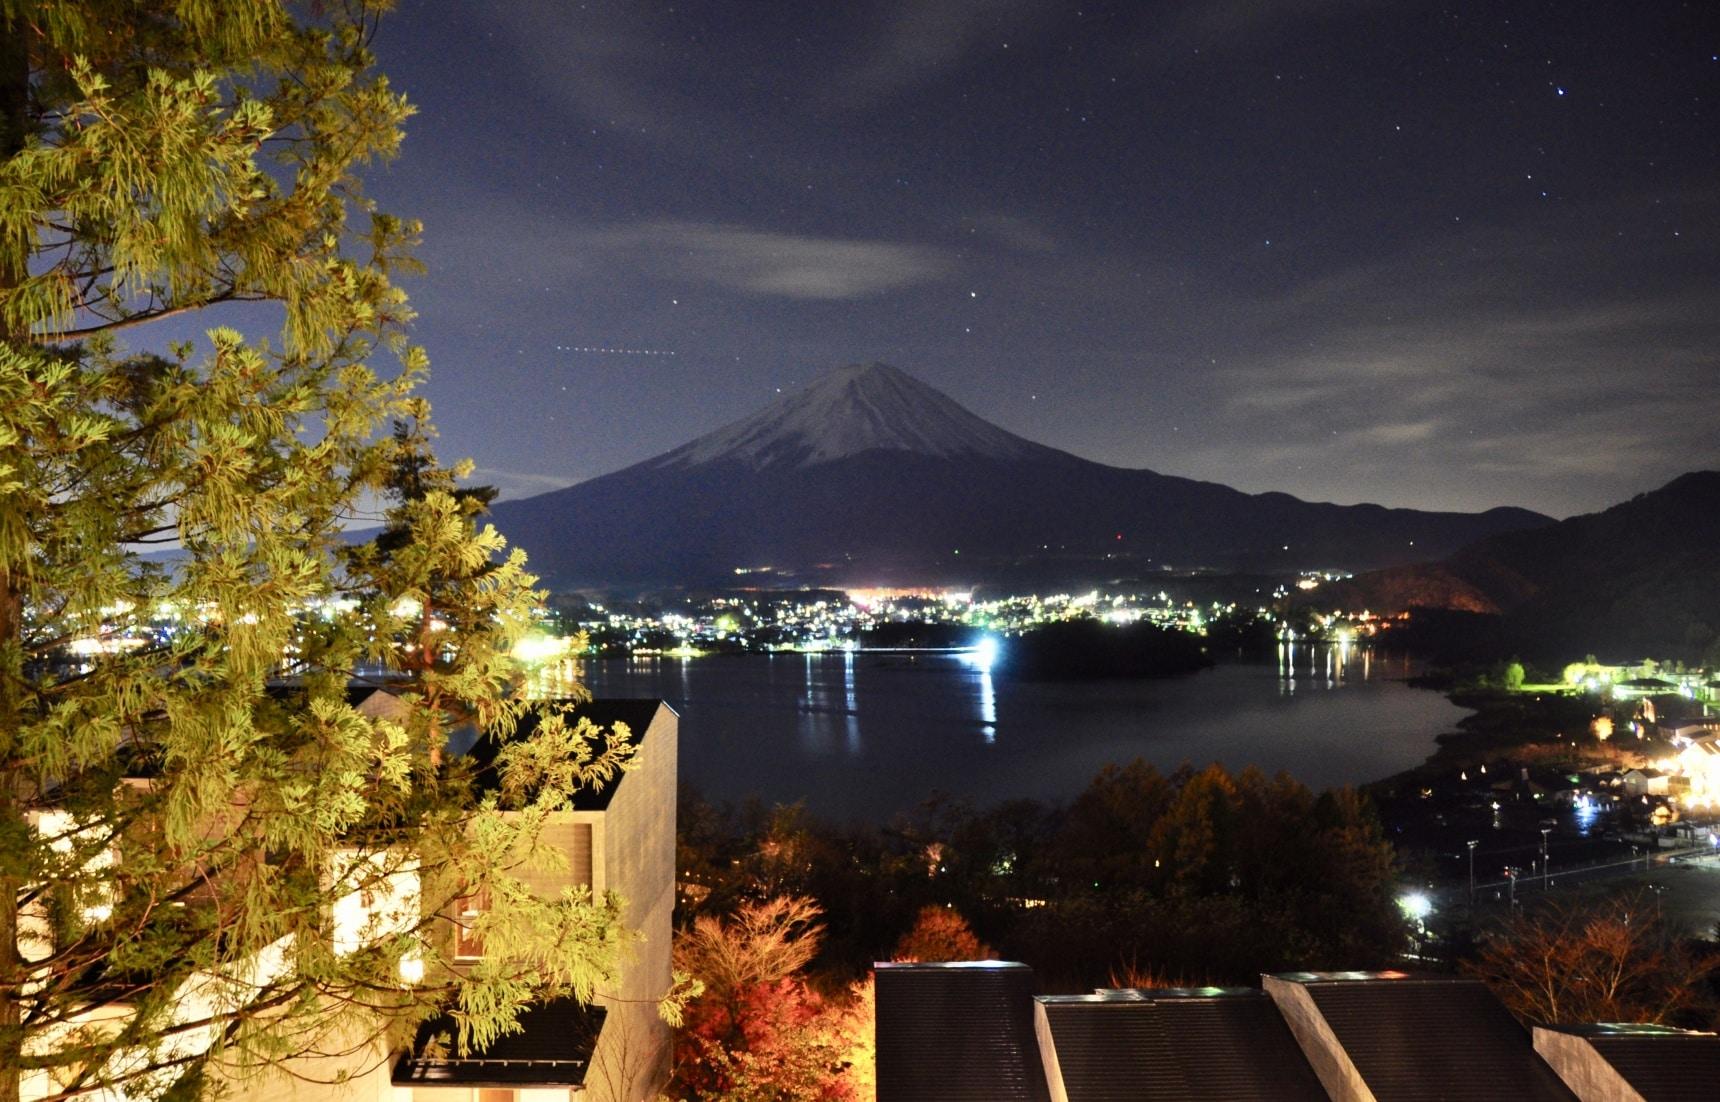 Hoshinoya Fuji: The Glamorous Outdoors